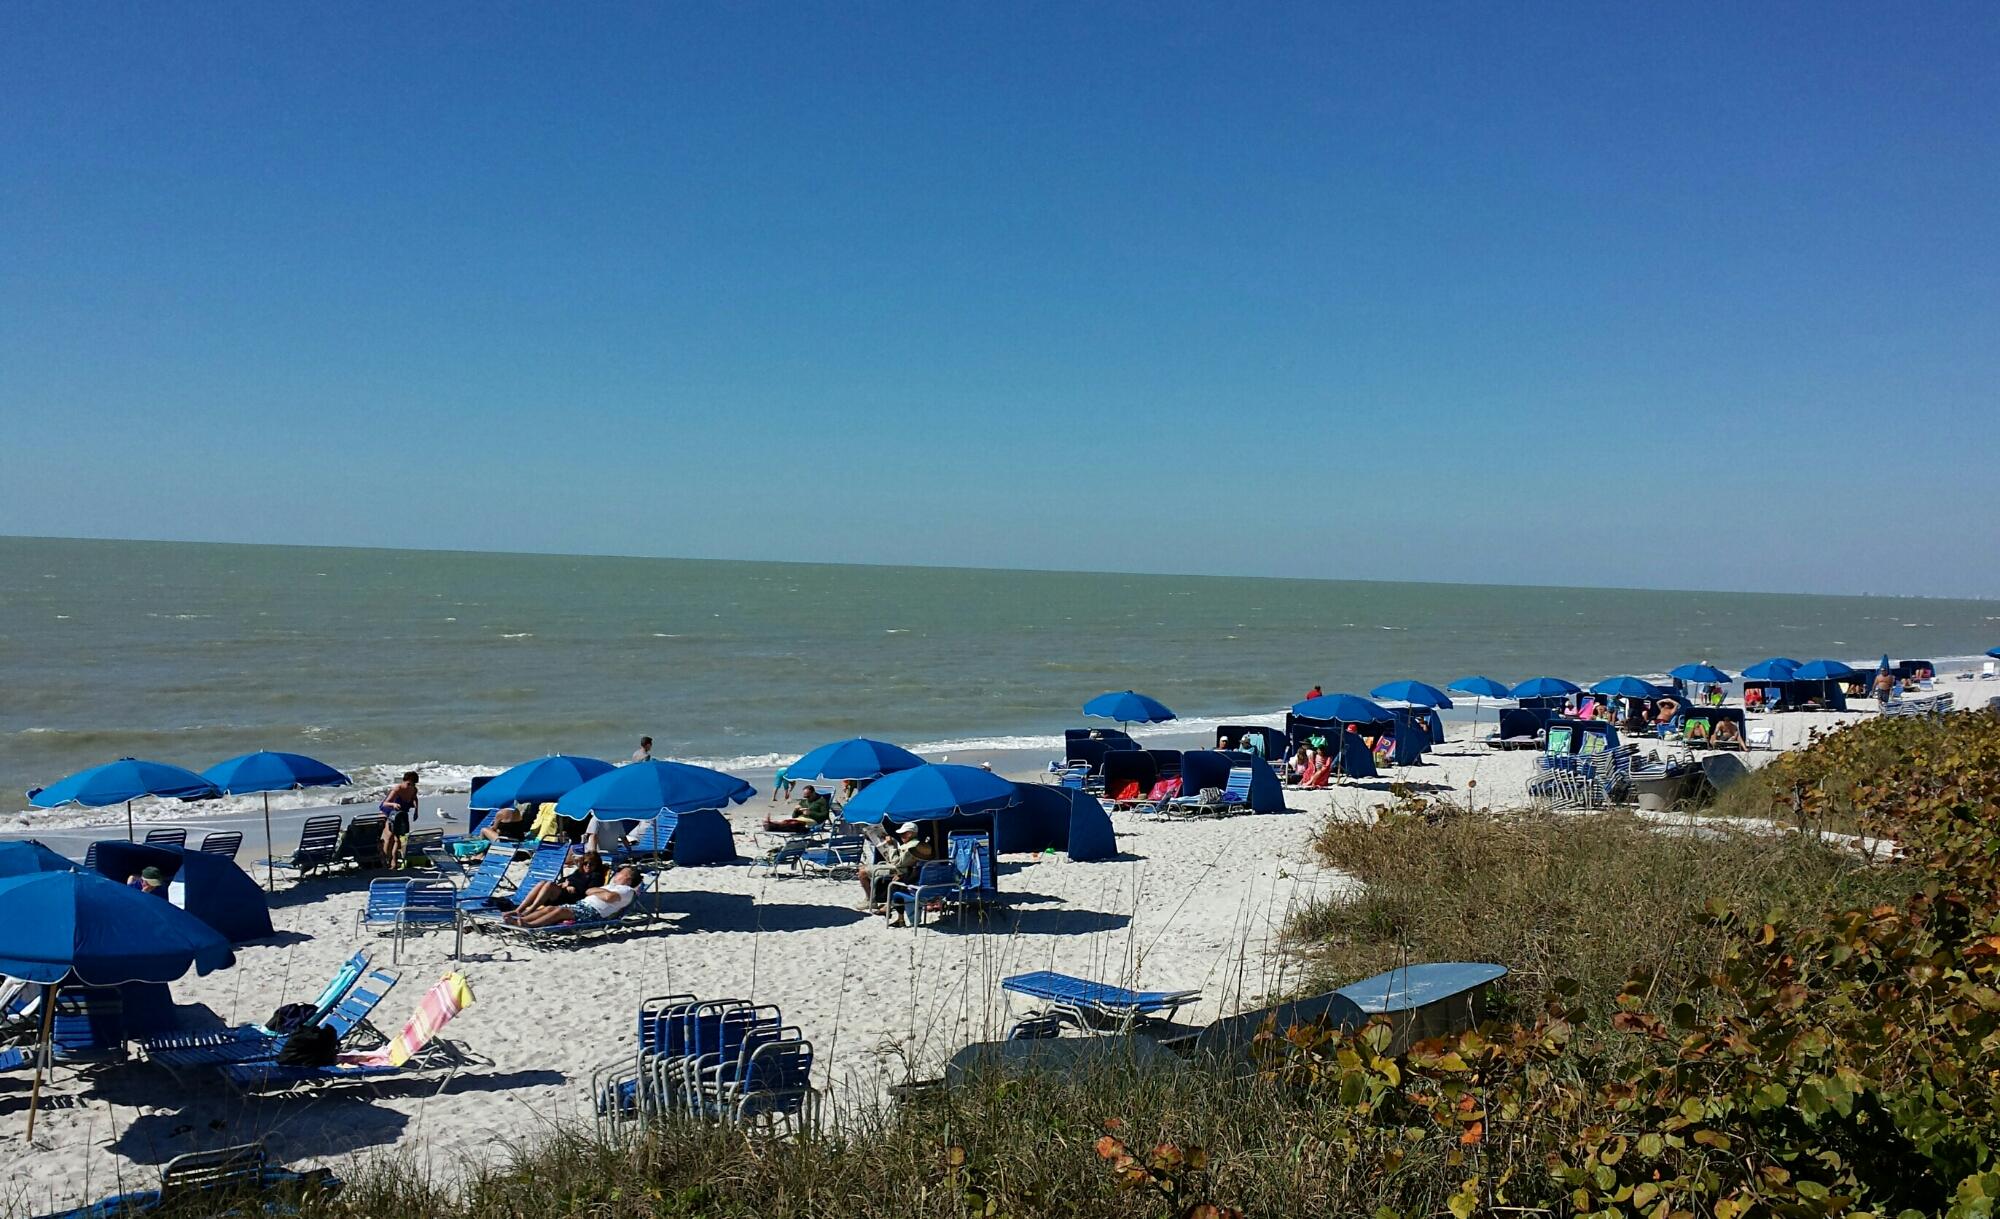 holiday rentals pelican bay naples florida - photo#26